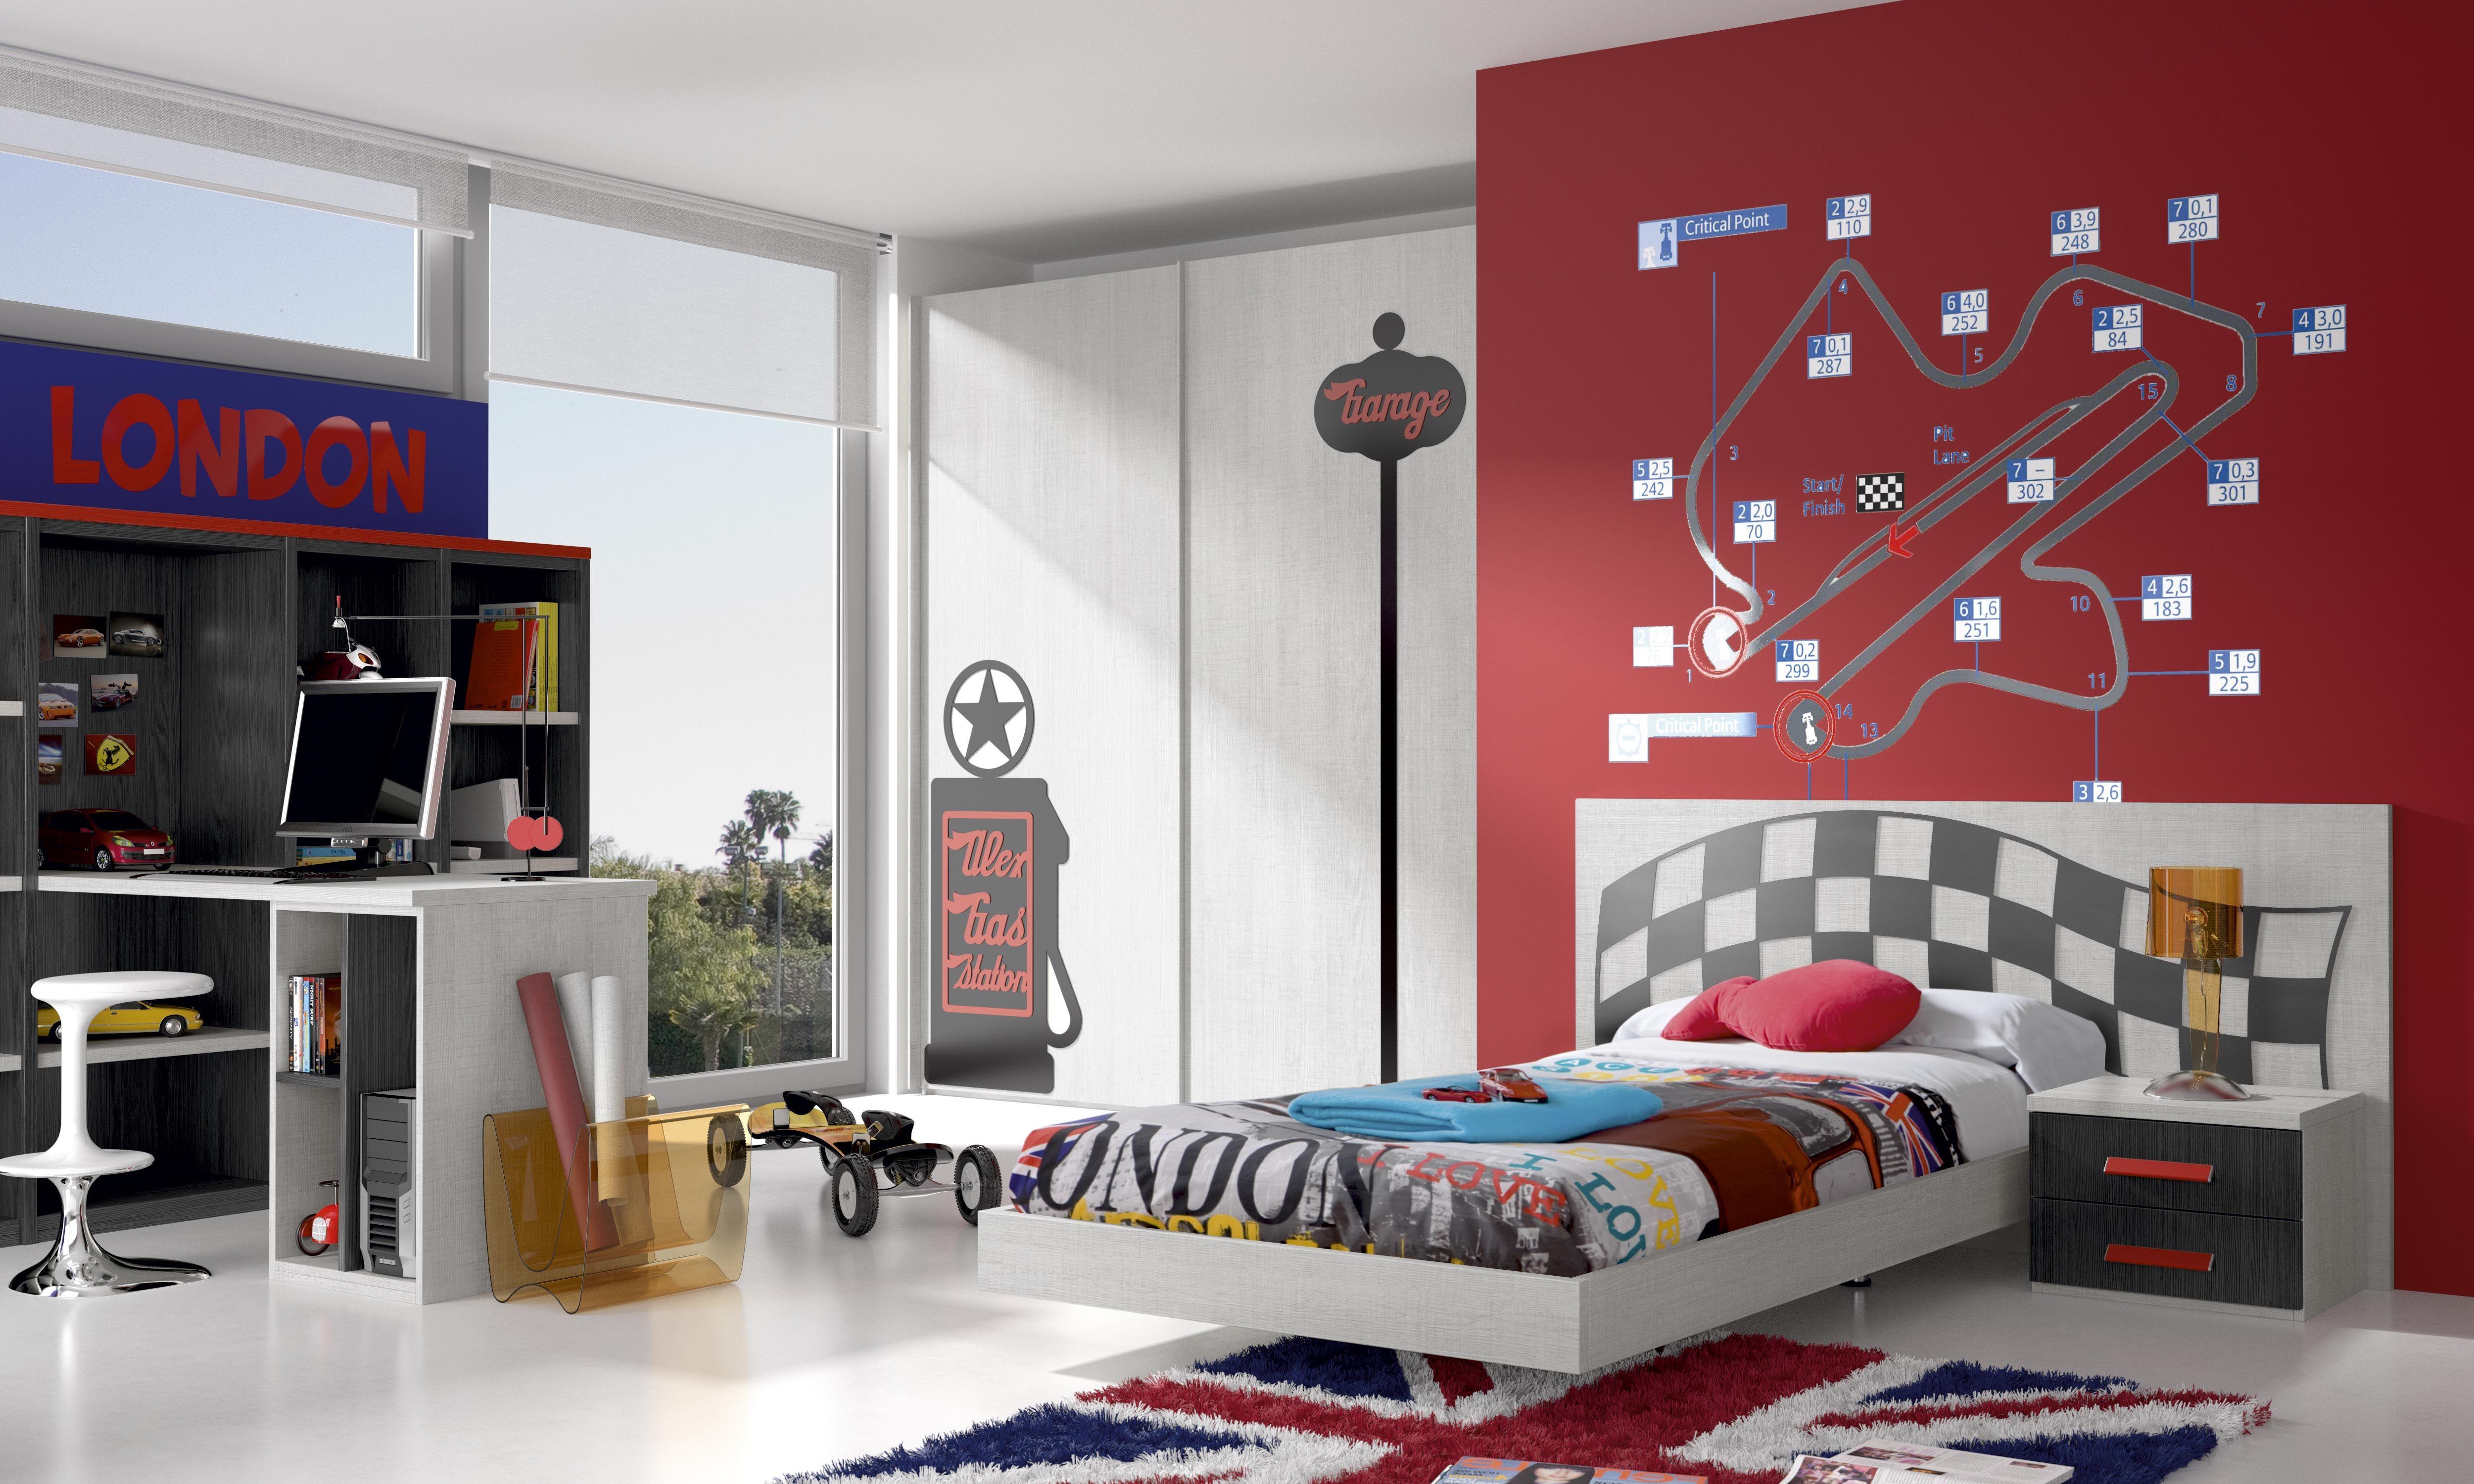 Habitaciones infantiles tem ticas dibujos animados coches4 - Habitaciones infantiles tematicas ...